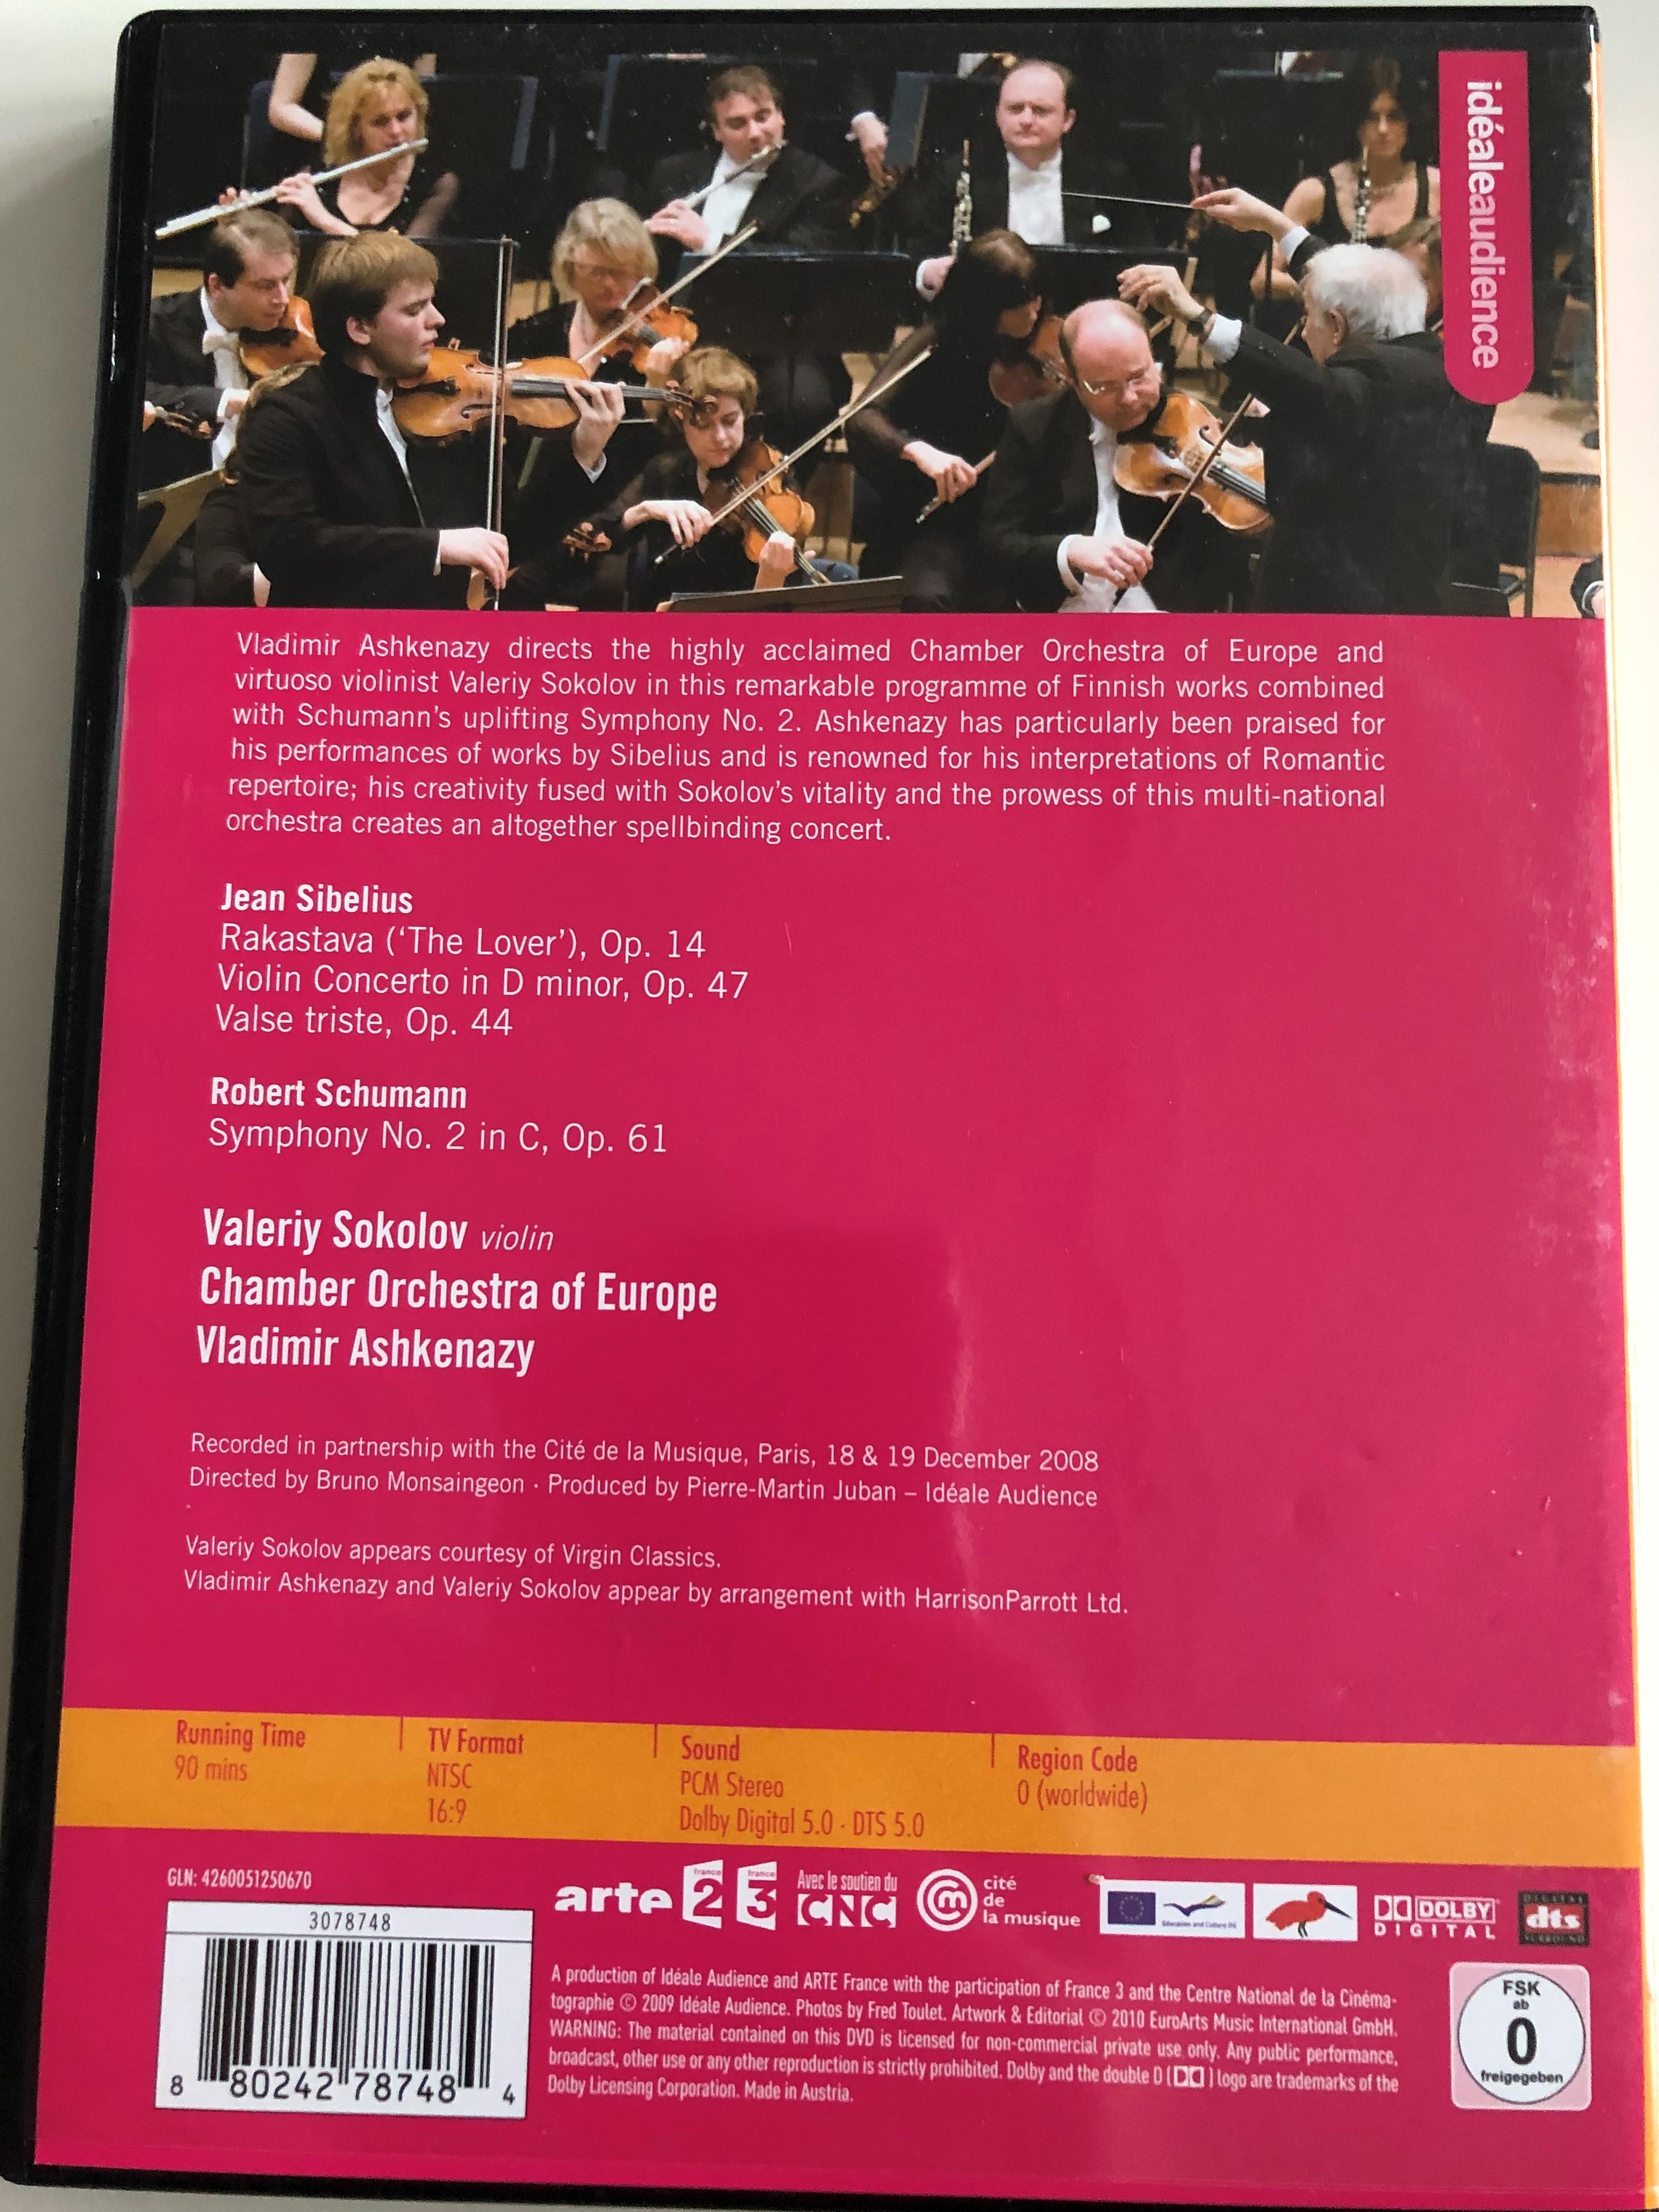 sibelius-violin-concerto-schumann-symphony-no.-2-dvd-2009-valeriy-sokolov-vladimir-ashkenazy-2.jpg